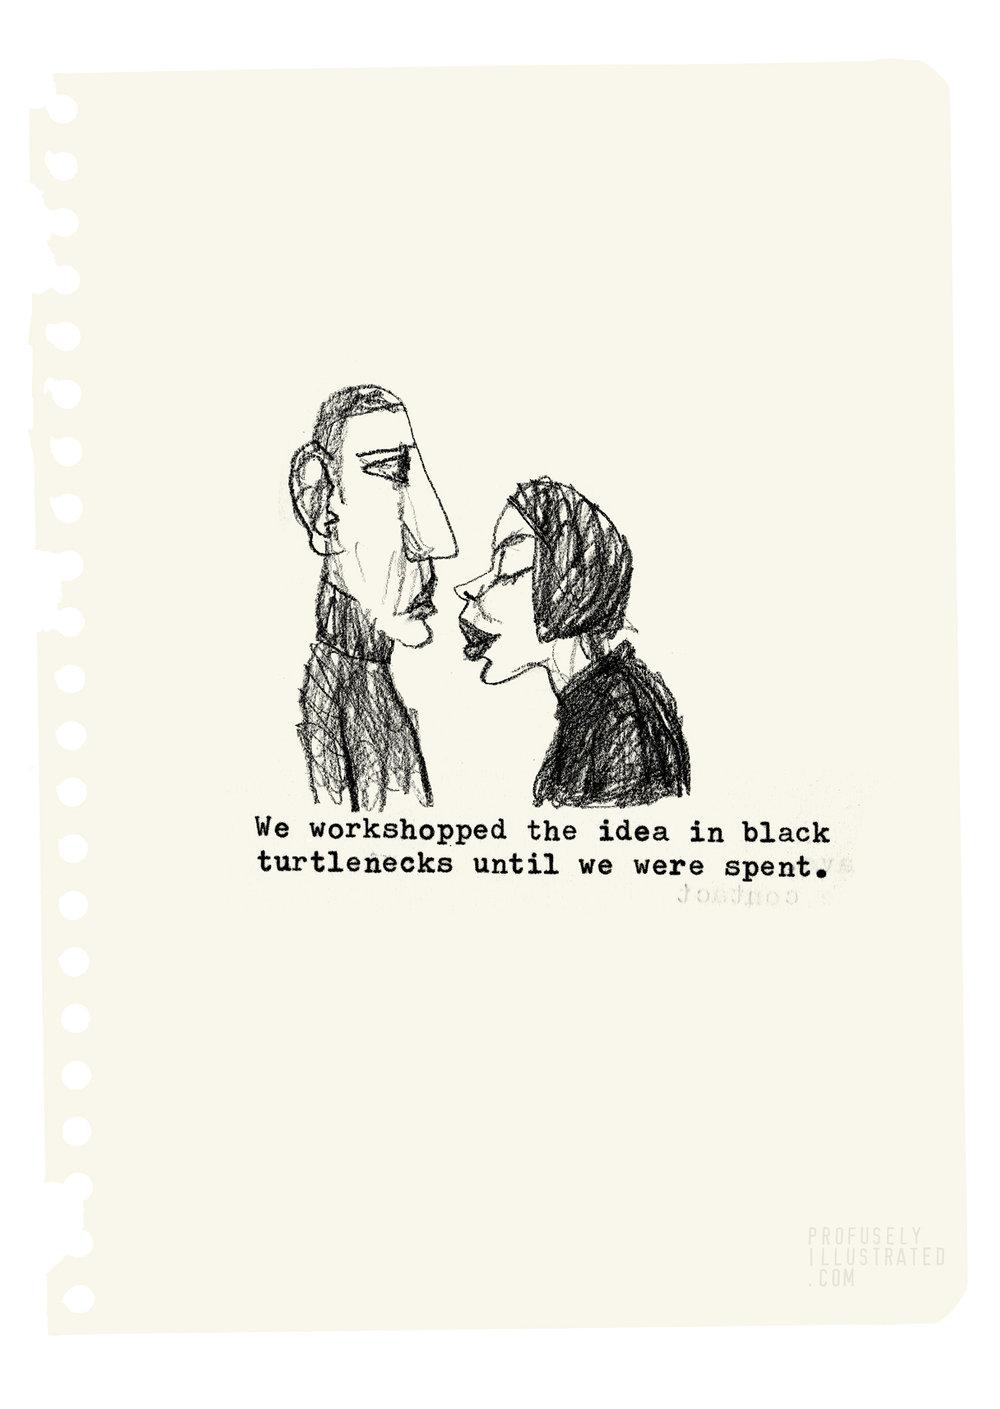 note to self #106 david mackintosh